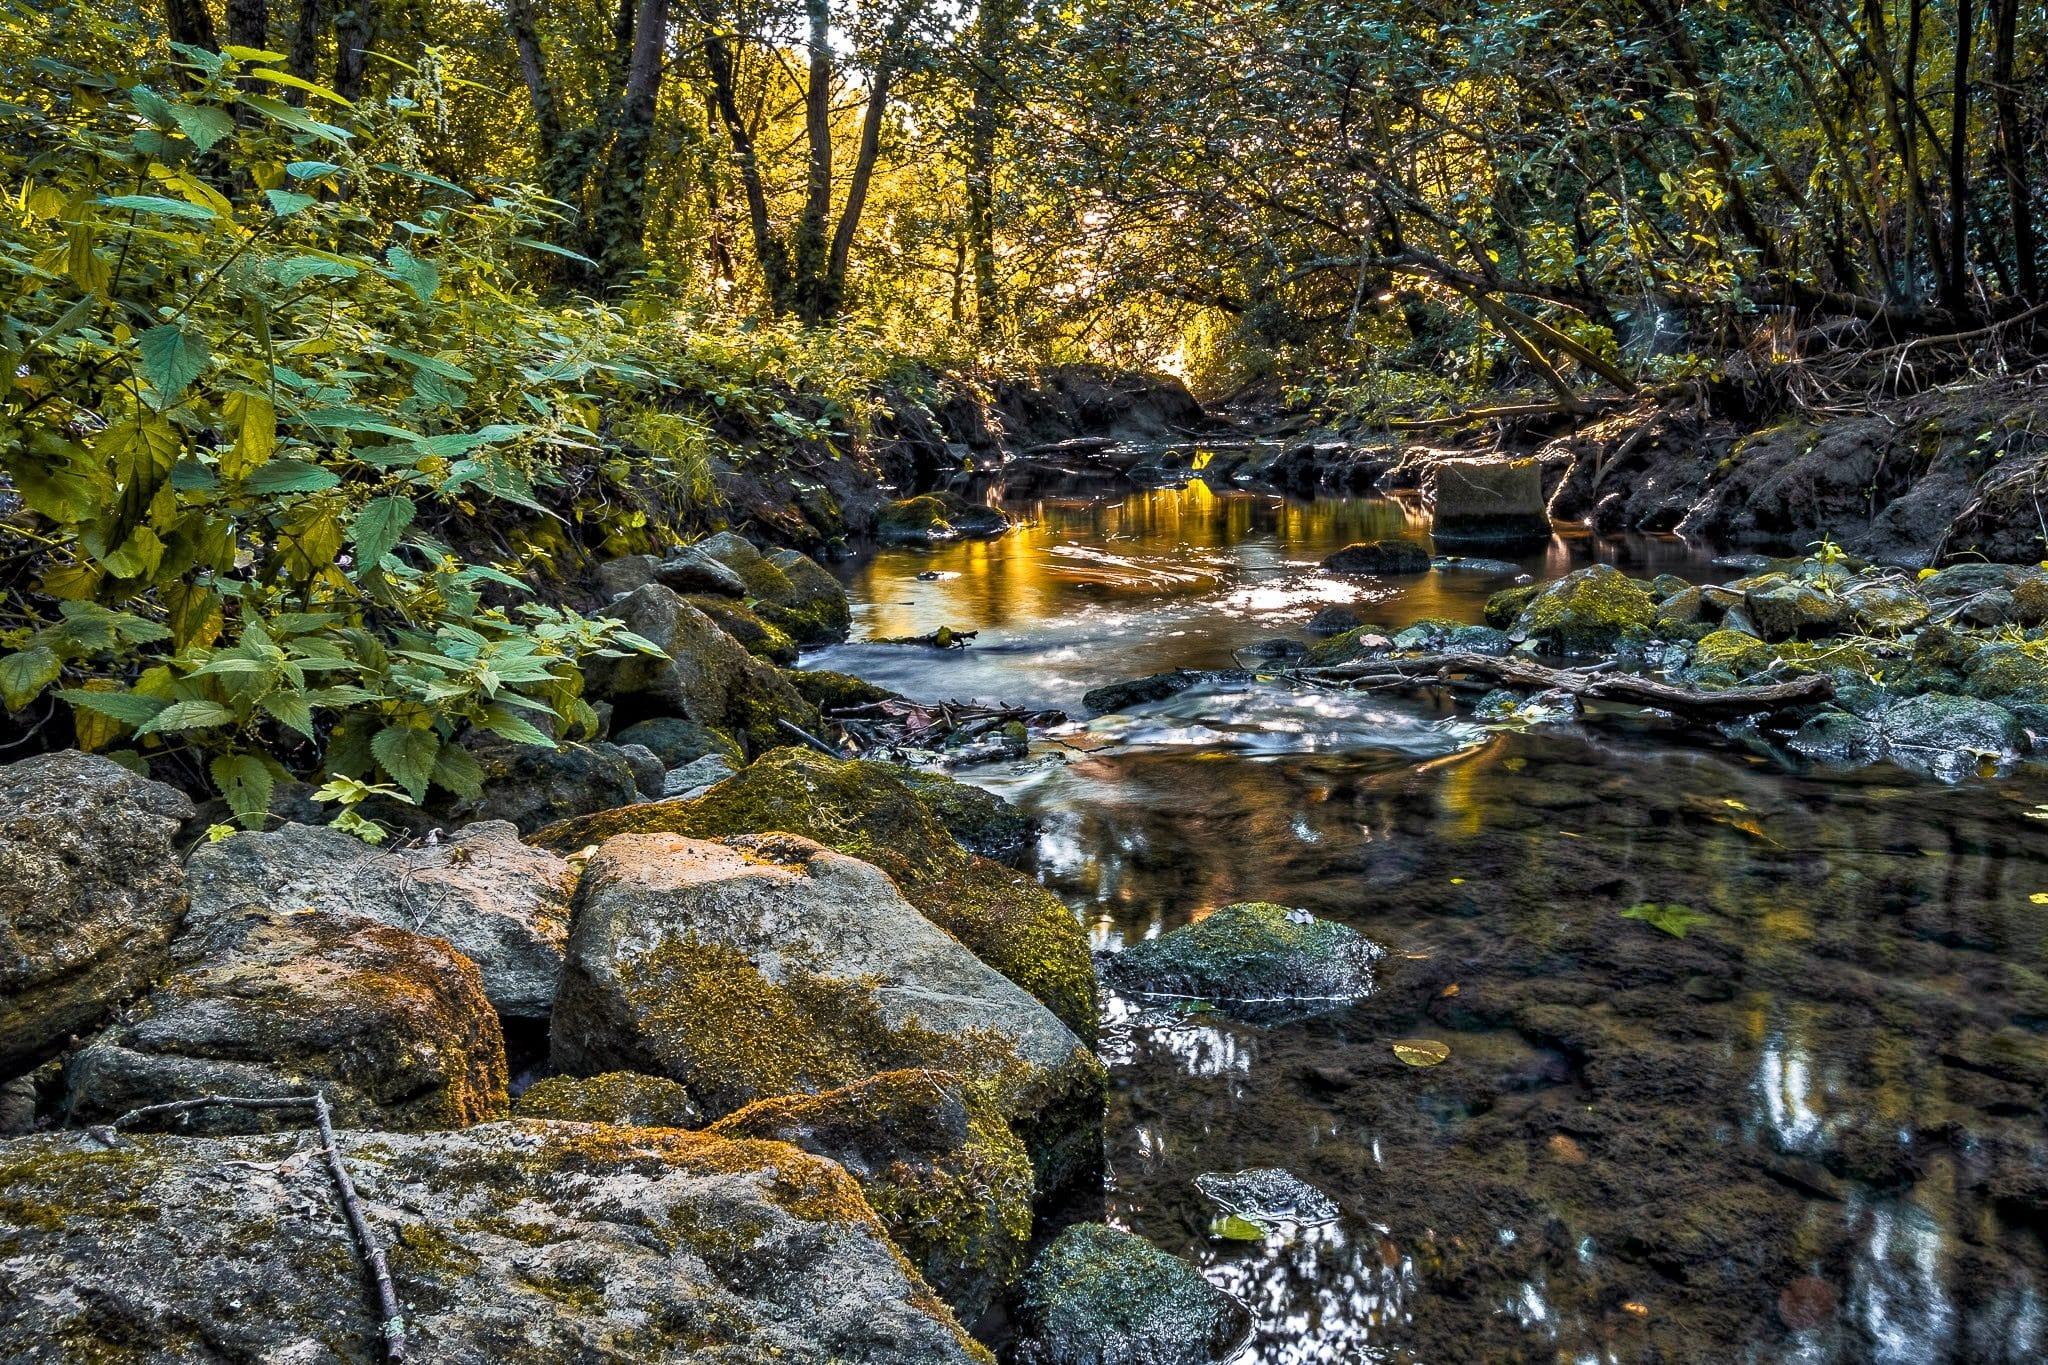 Le ruisseau du Floubalay